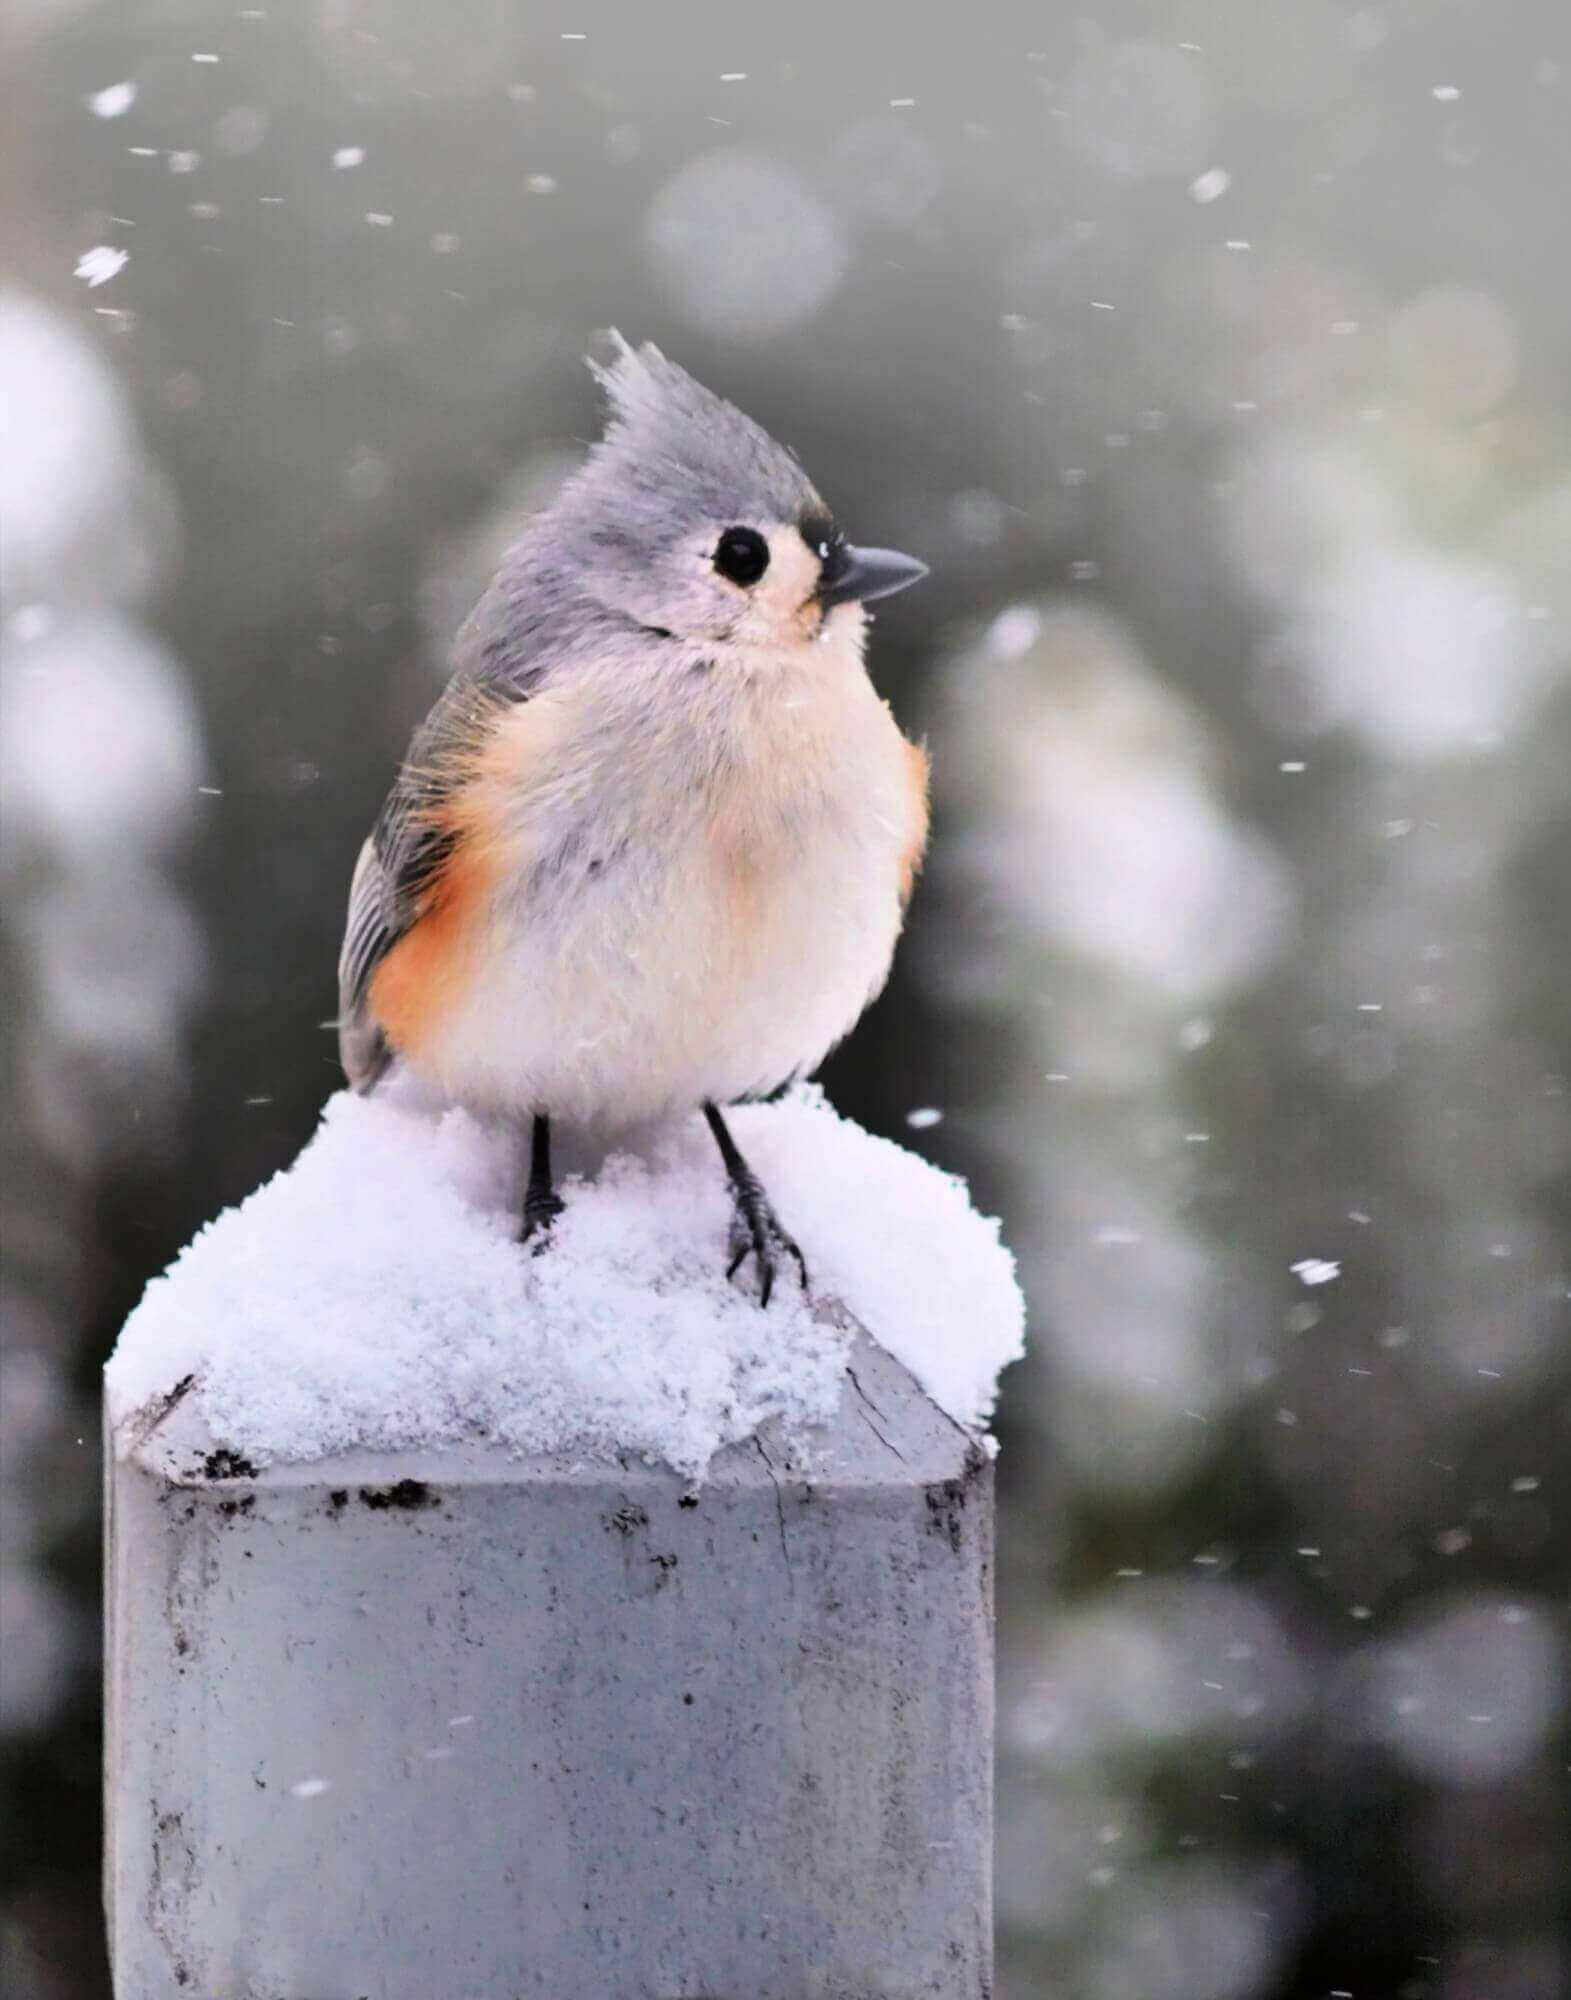 Photograph: tufted Titmouse Bird